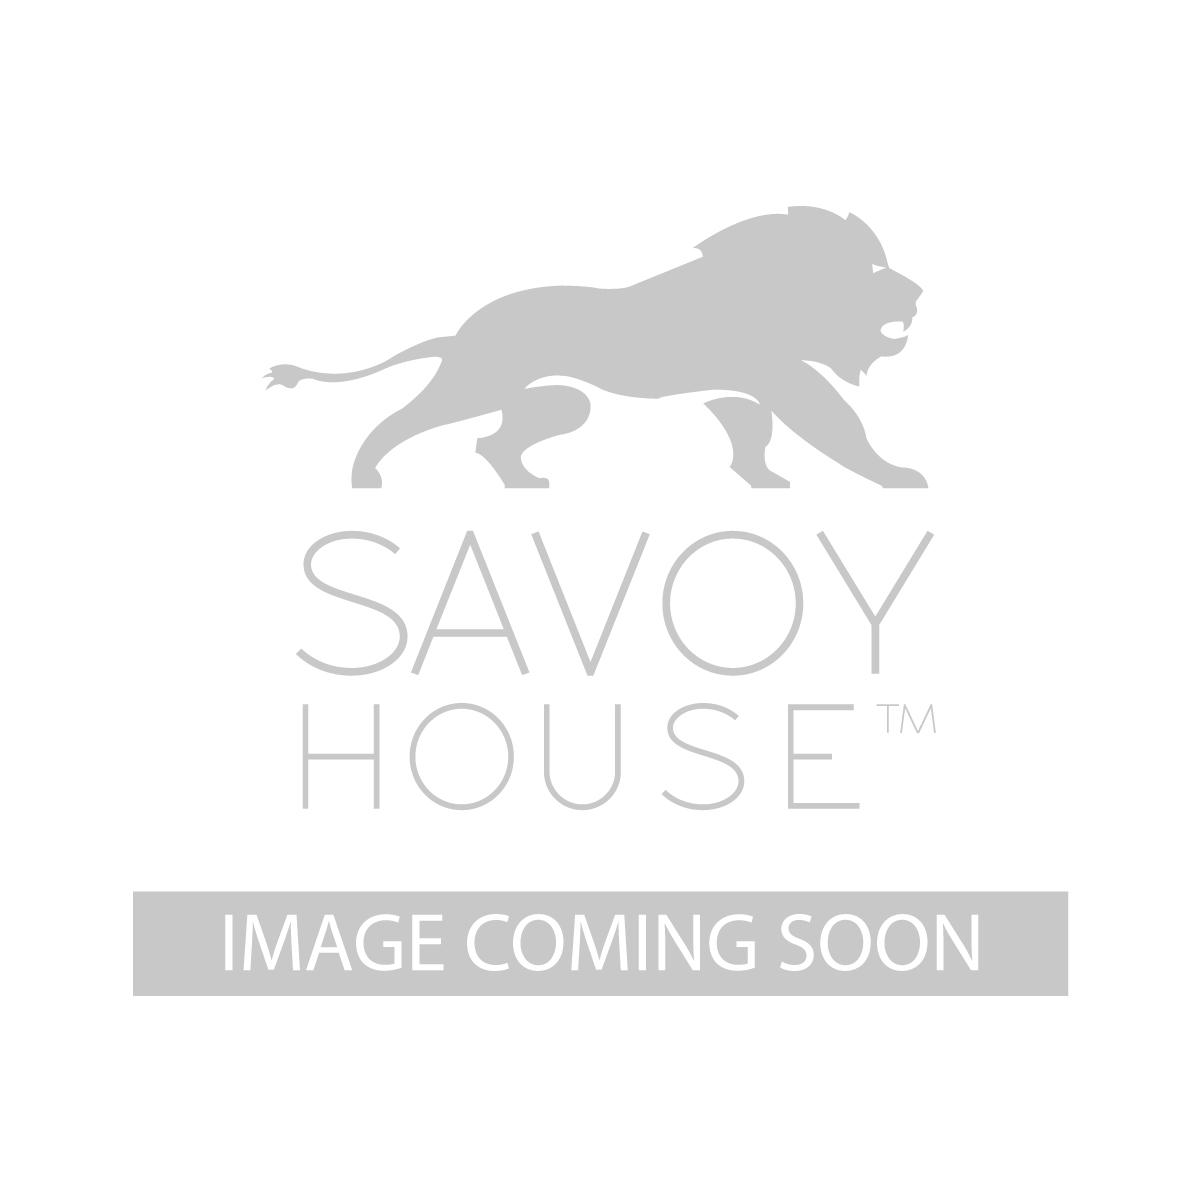 5 3802 40 Realto Wall Mount Lantern By Savoy House